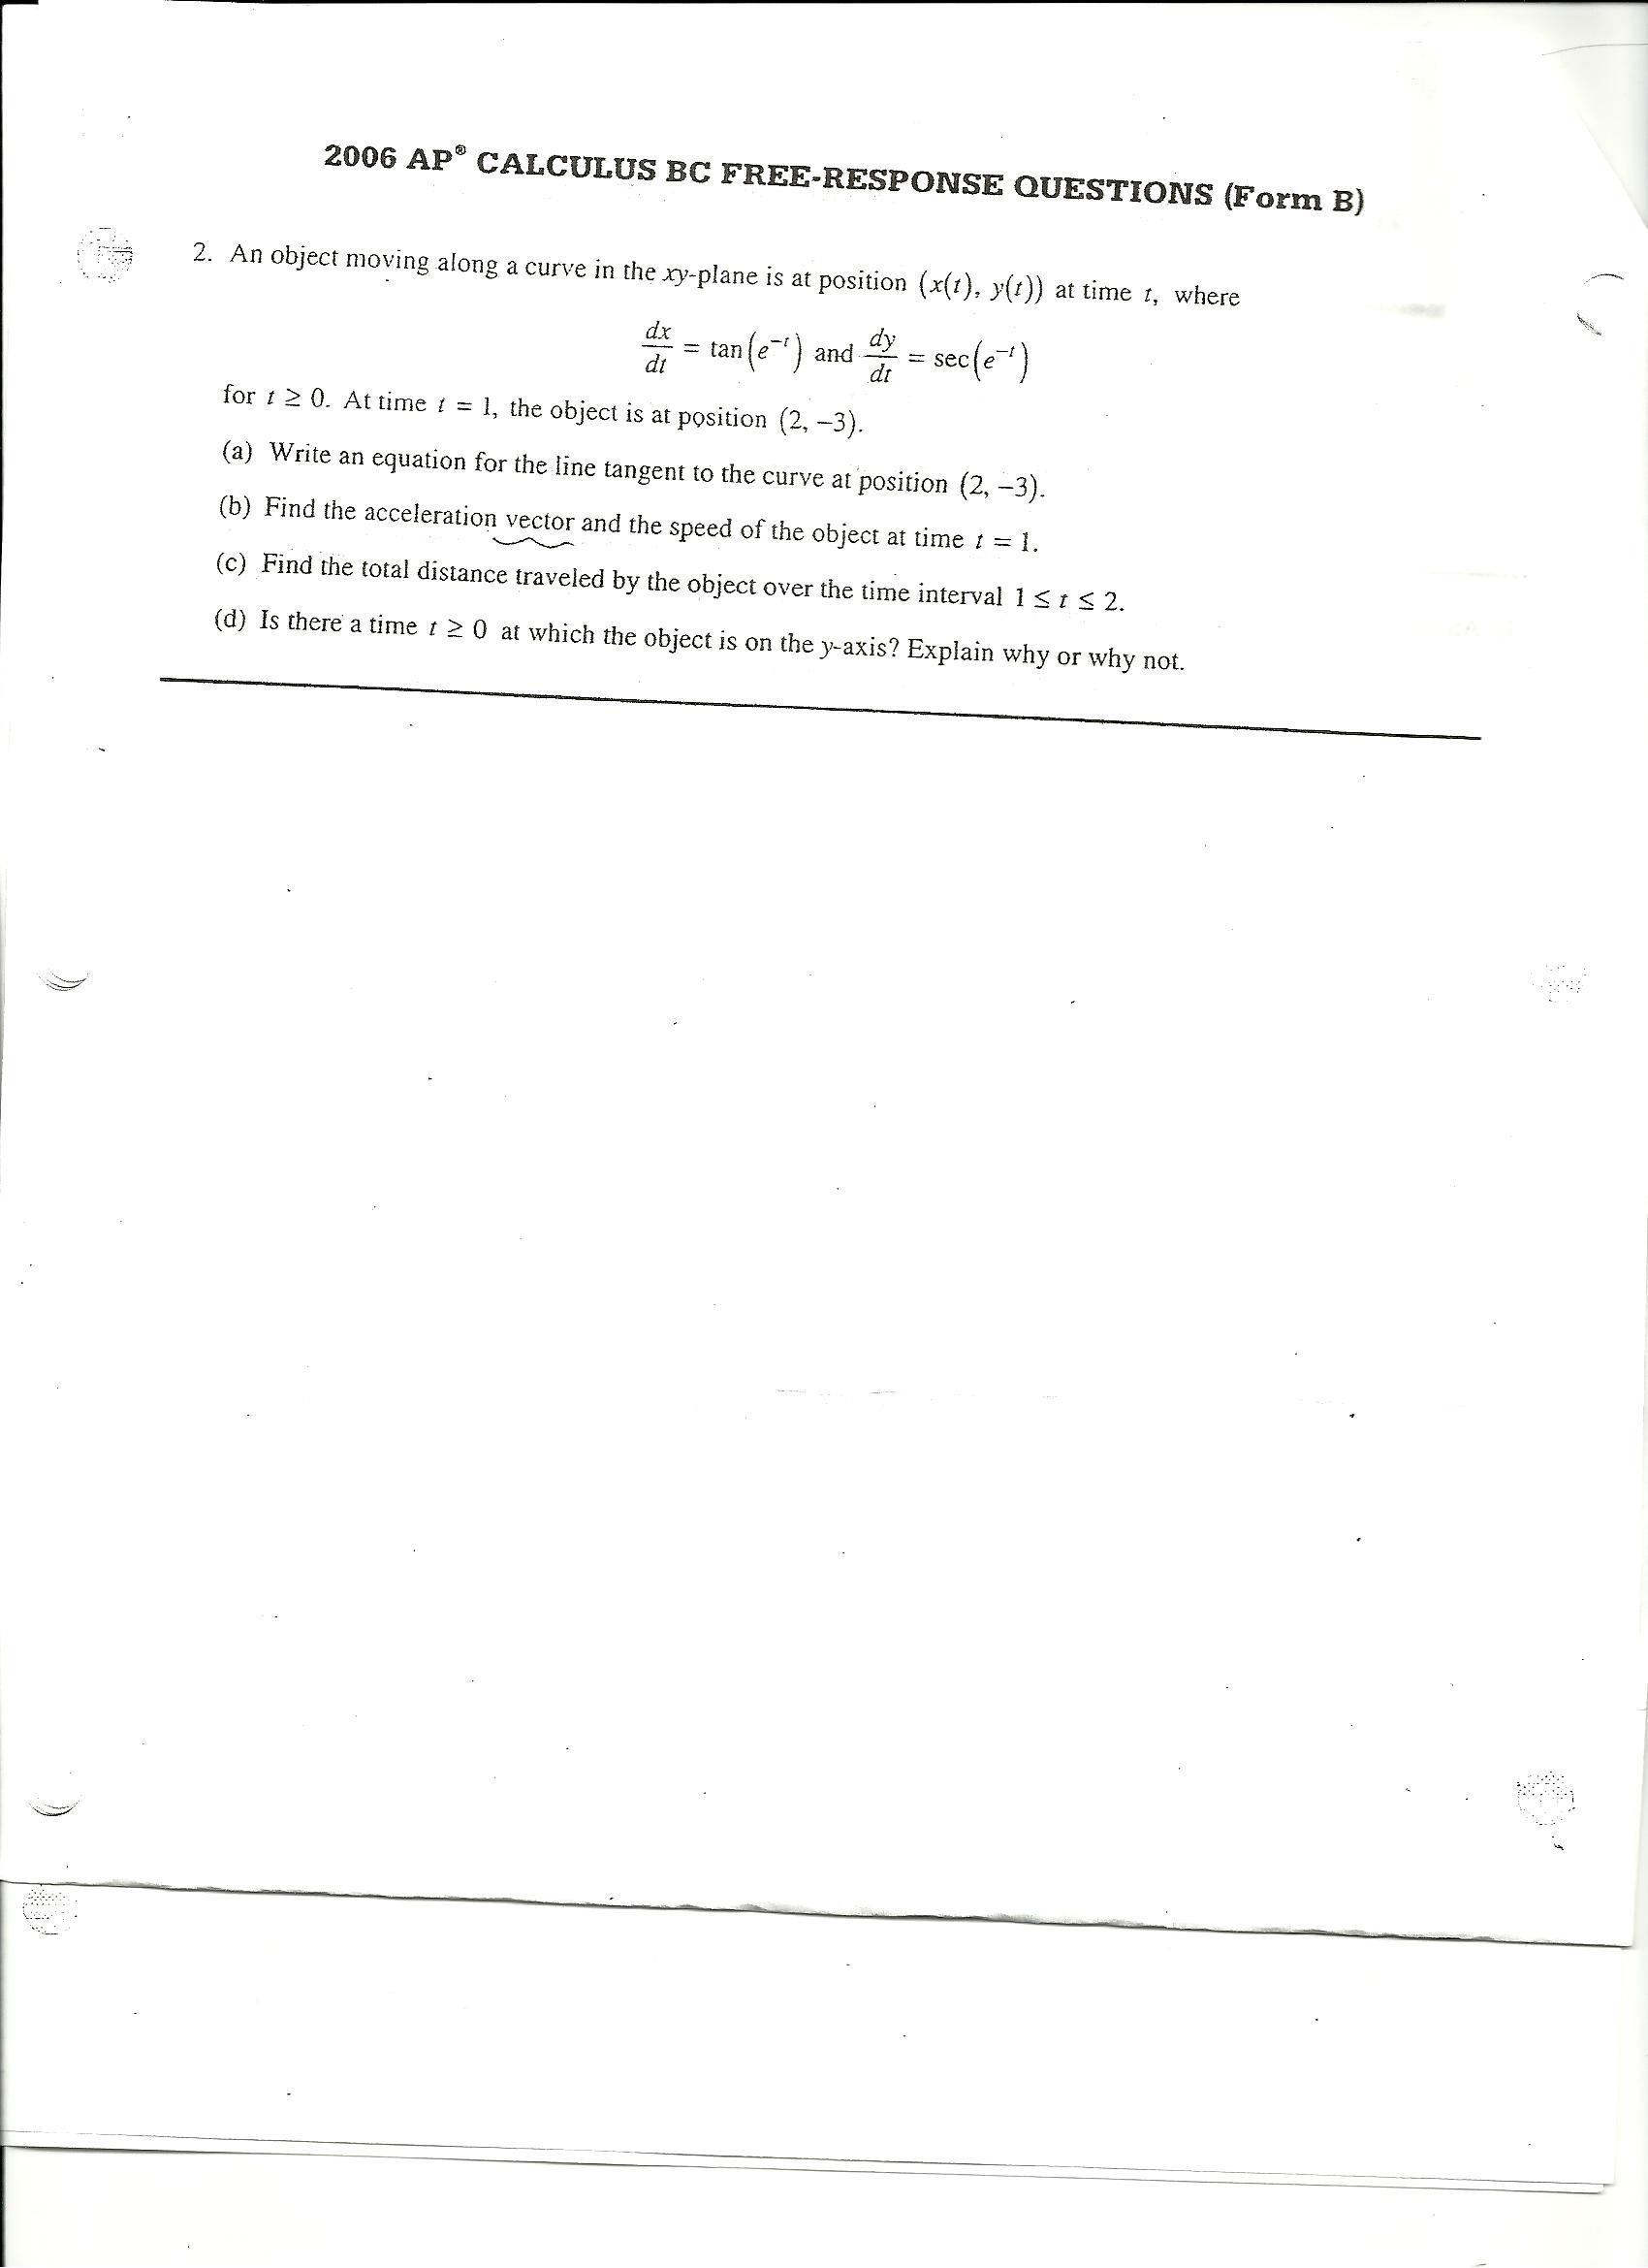 2006 AP CALCULUS BE FREE-RESPONSE QUESTIONS (Form ... | Chegg.com